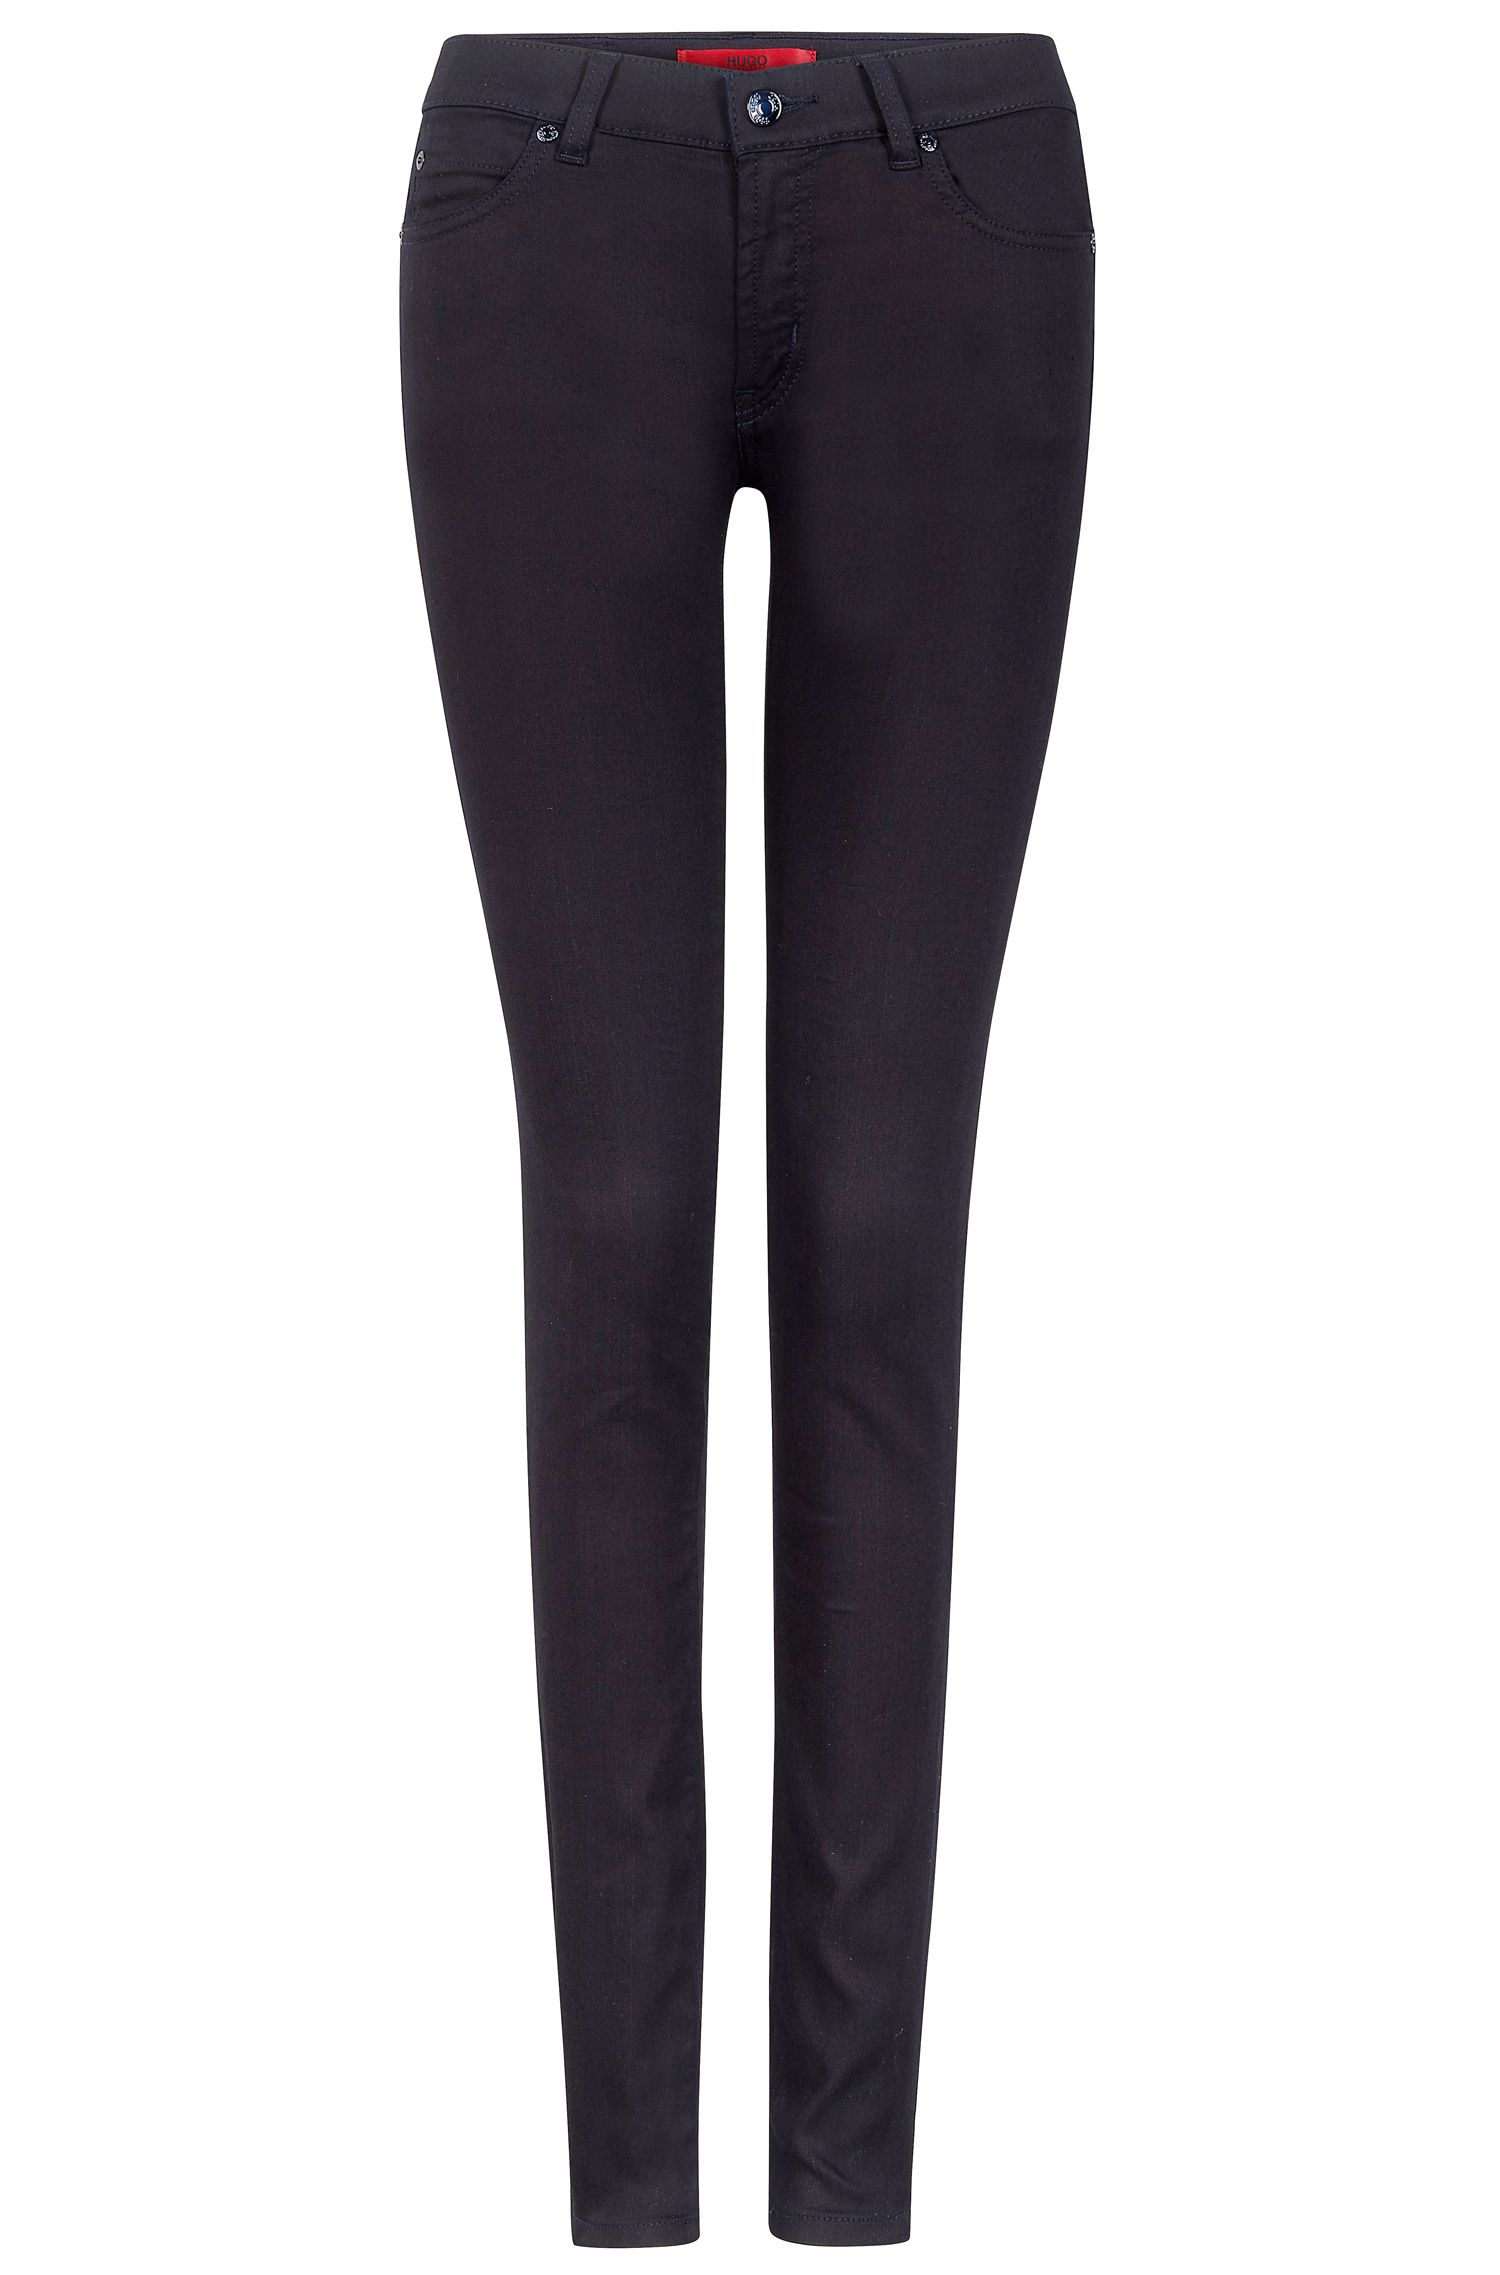 'Ginja' | Skinny Stretch Cotton Jeans